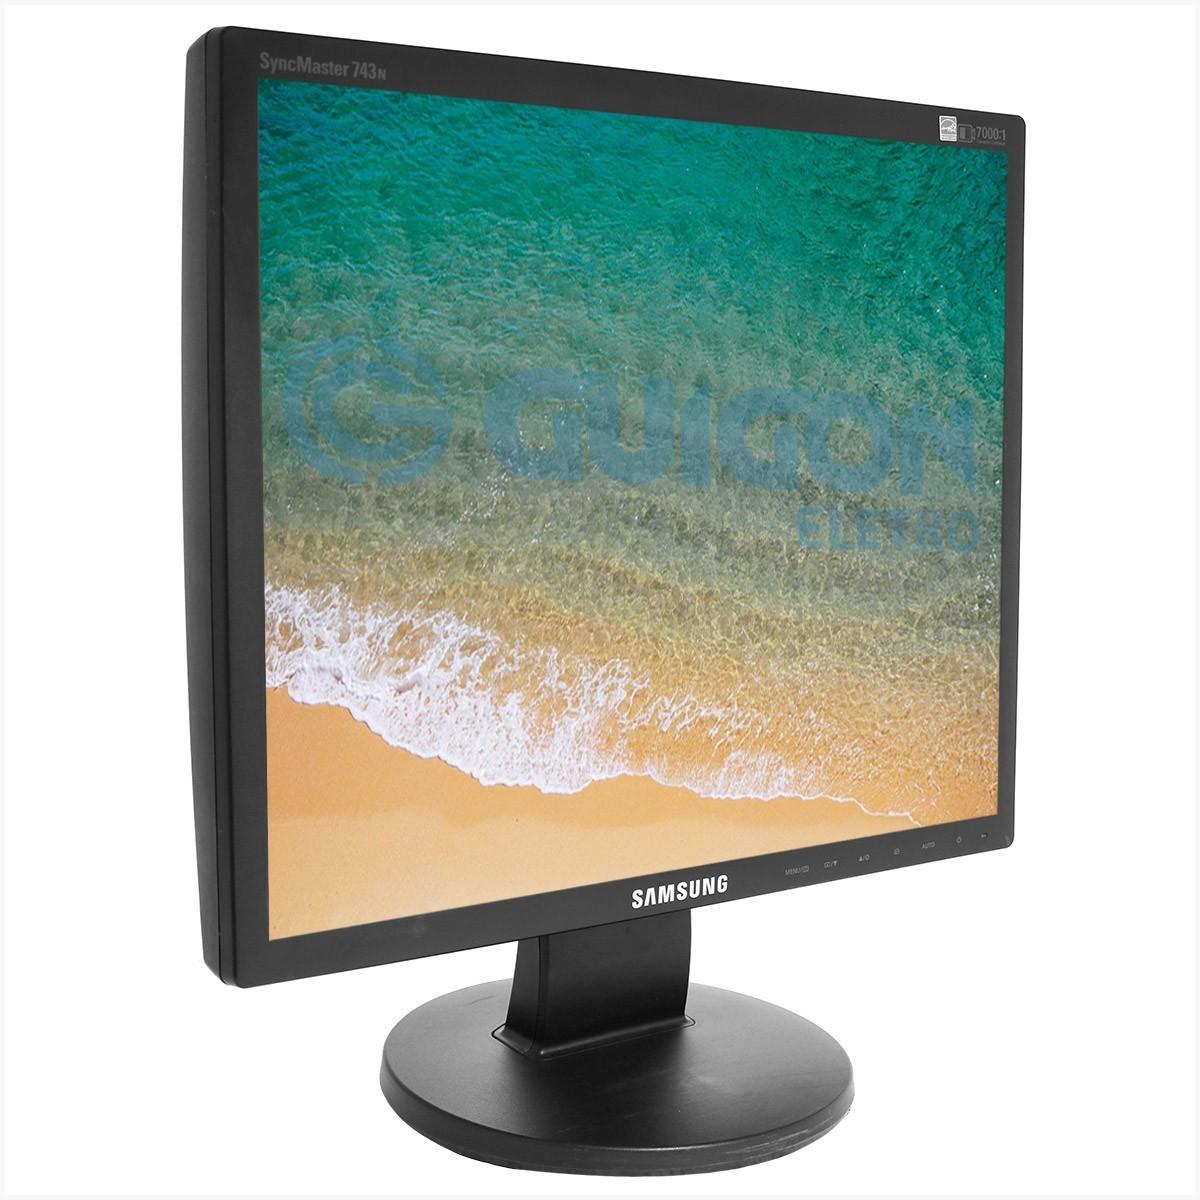 "Monitor Samsung 743N 17"" - Usado"